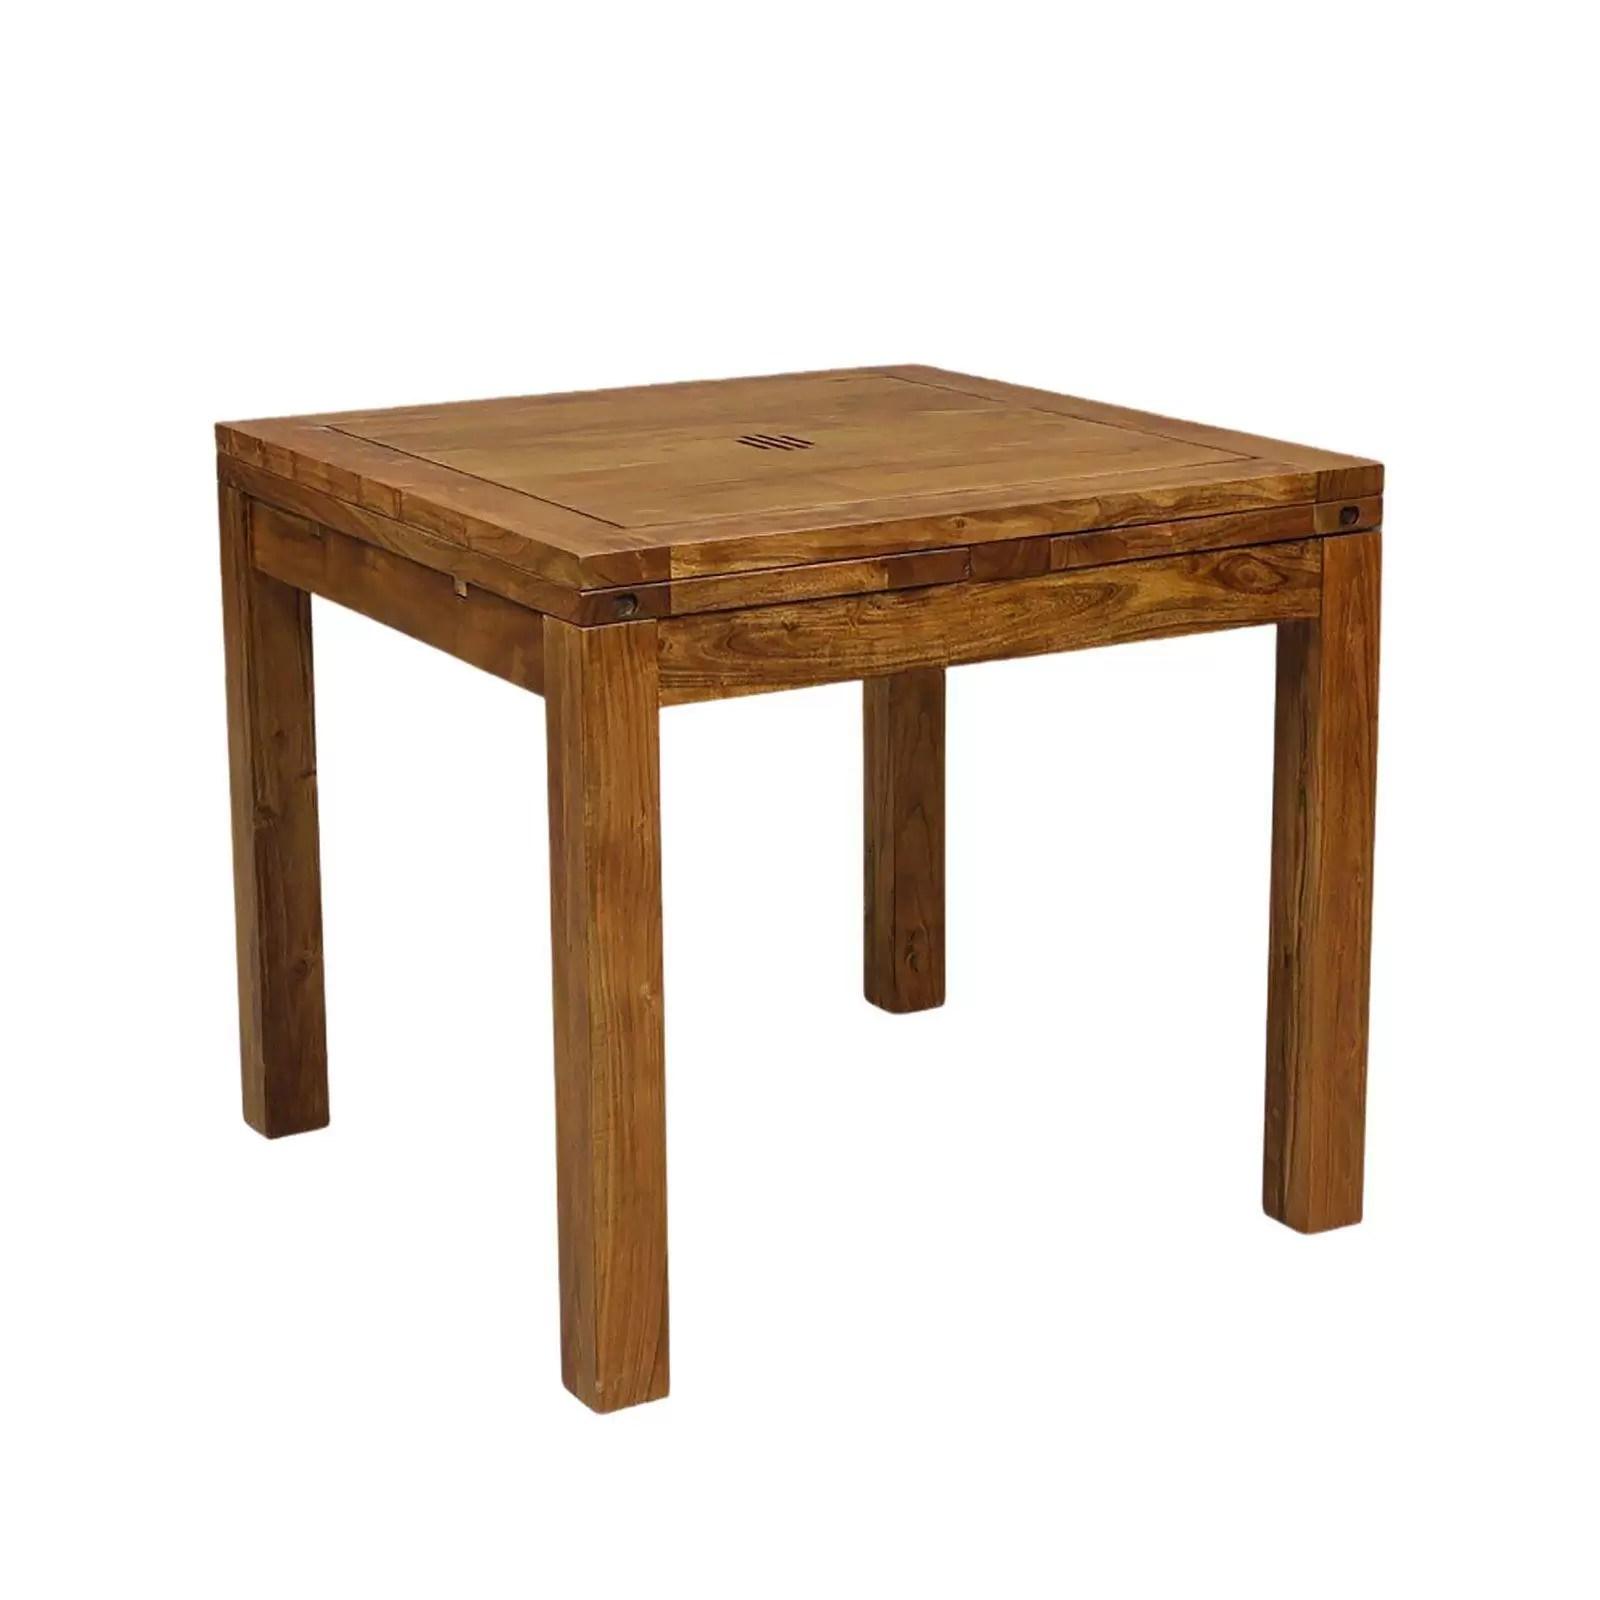 table de repas carree ethnique chic gordon 2 allonges en acacia massif